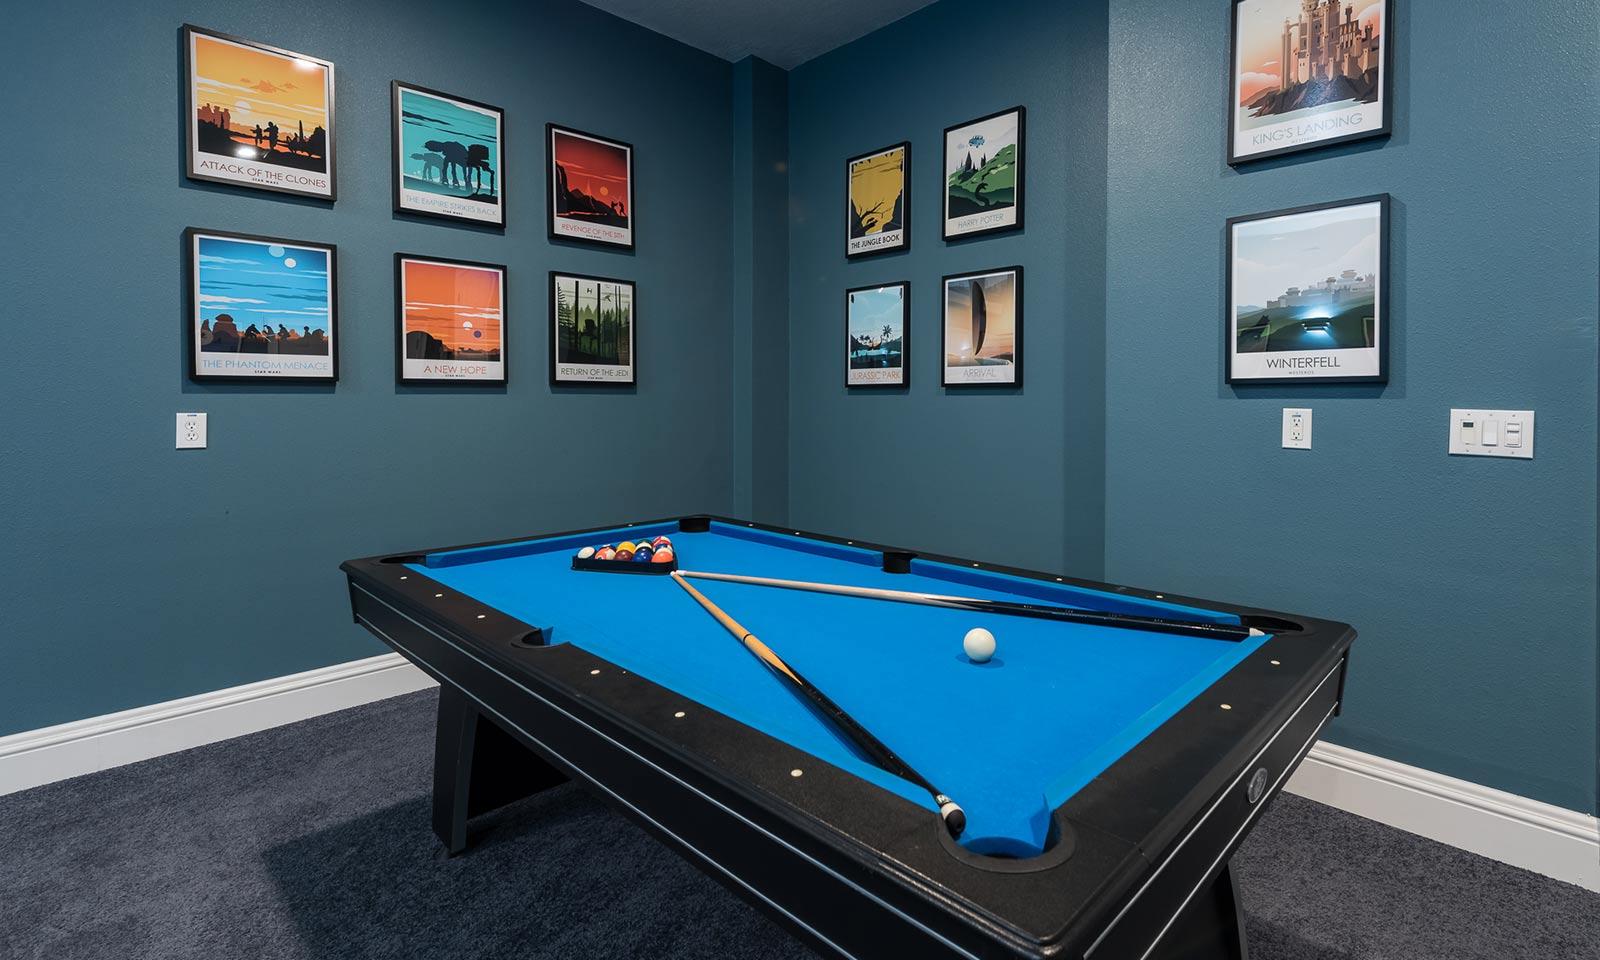 [amenities:Pool-Table:1] Pool Table